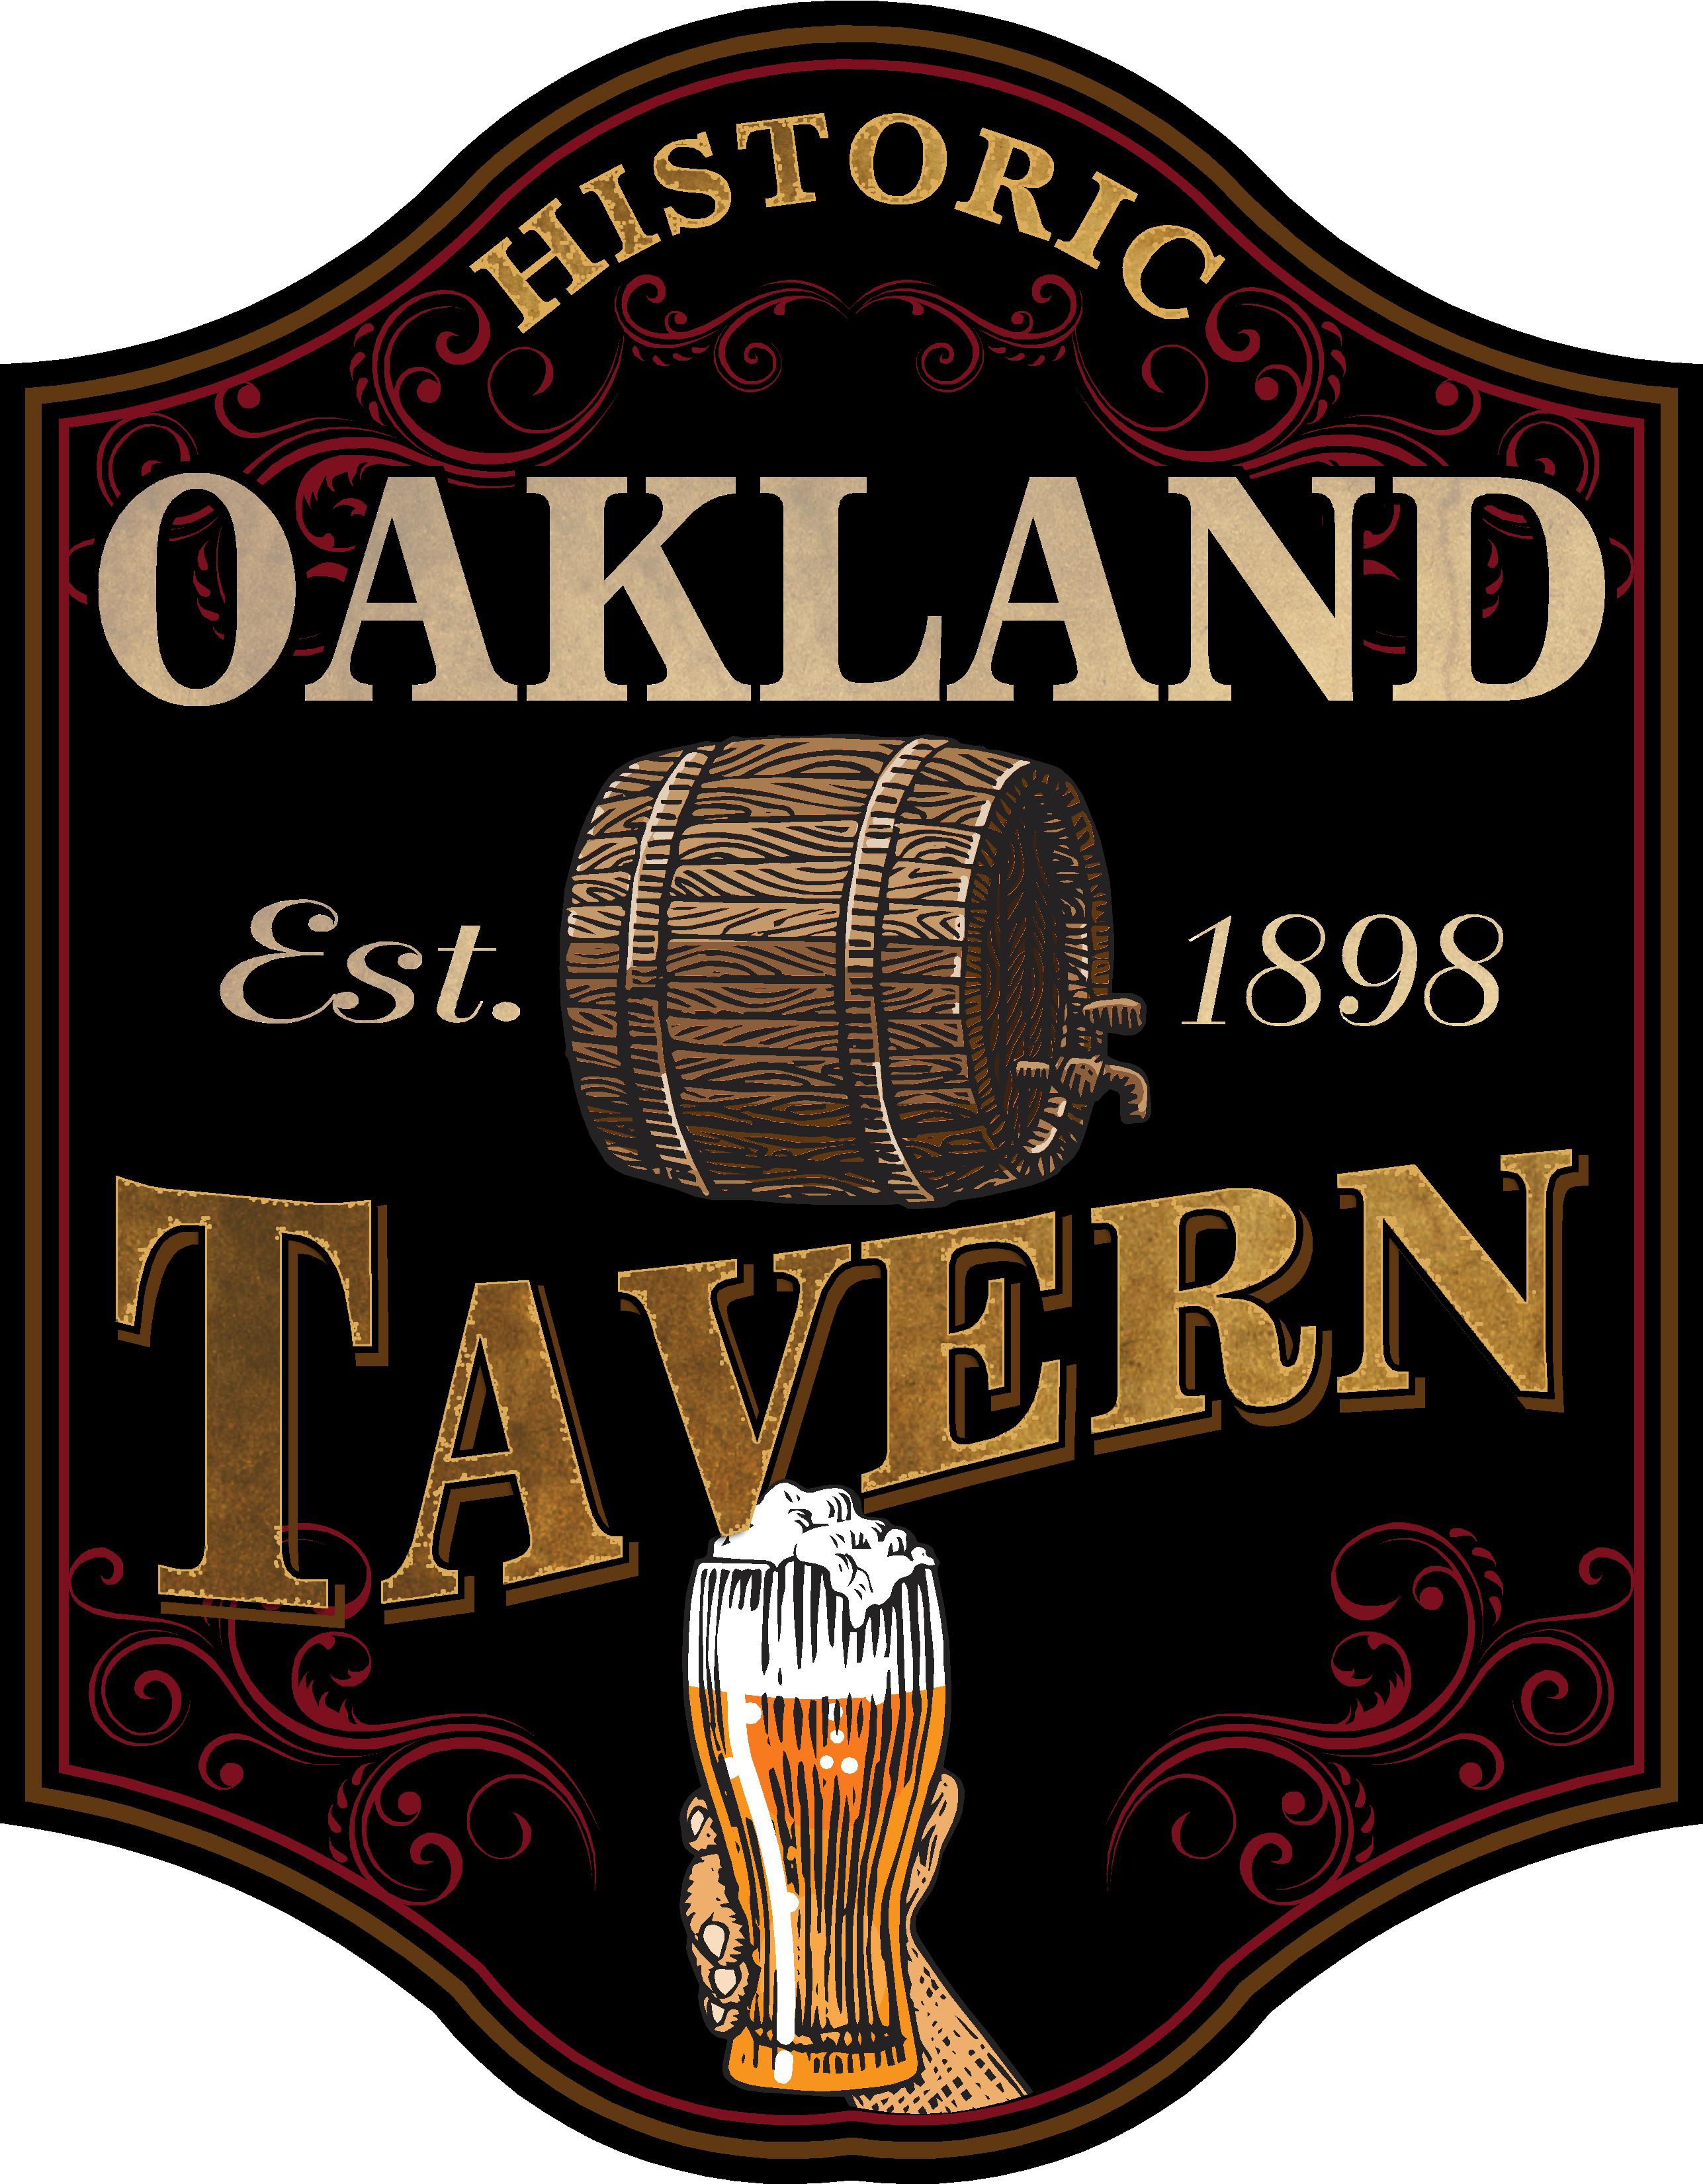 Oakland Tavern Logo